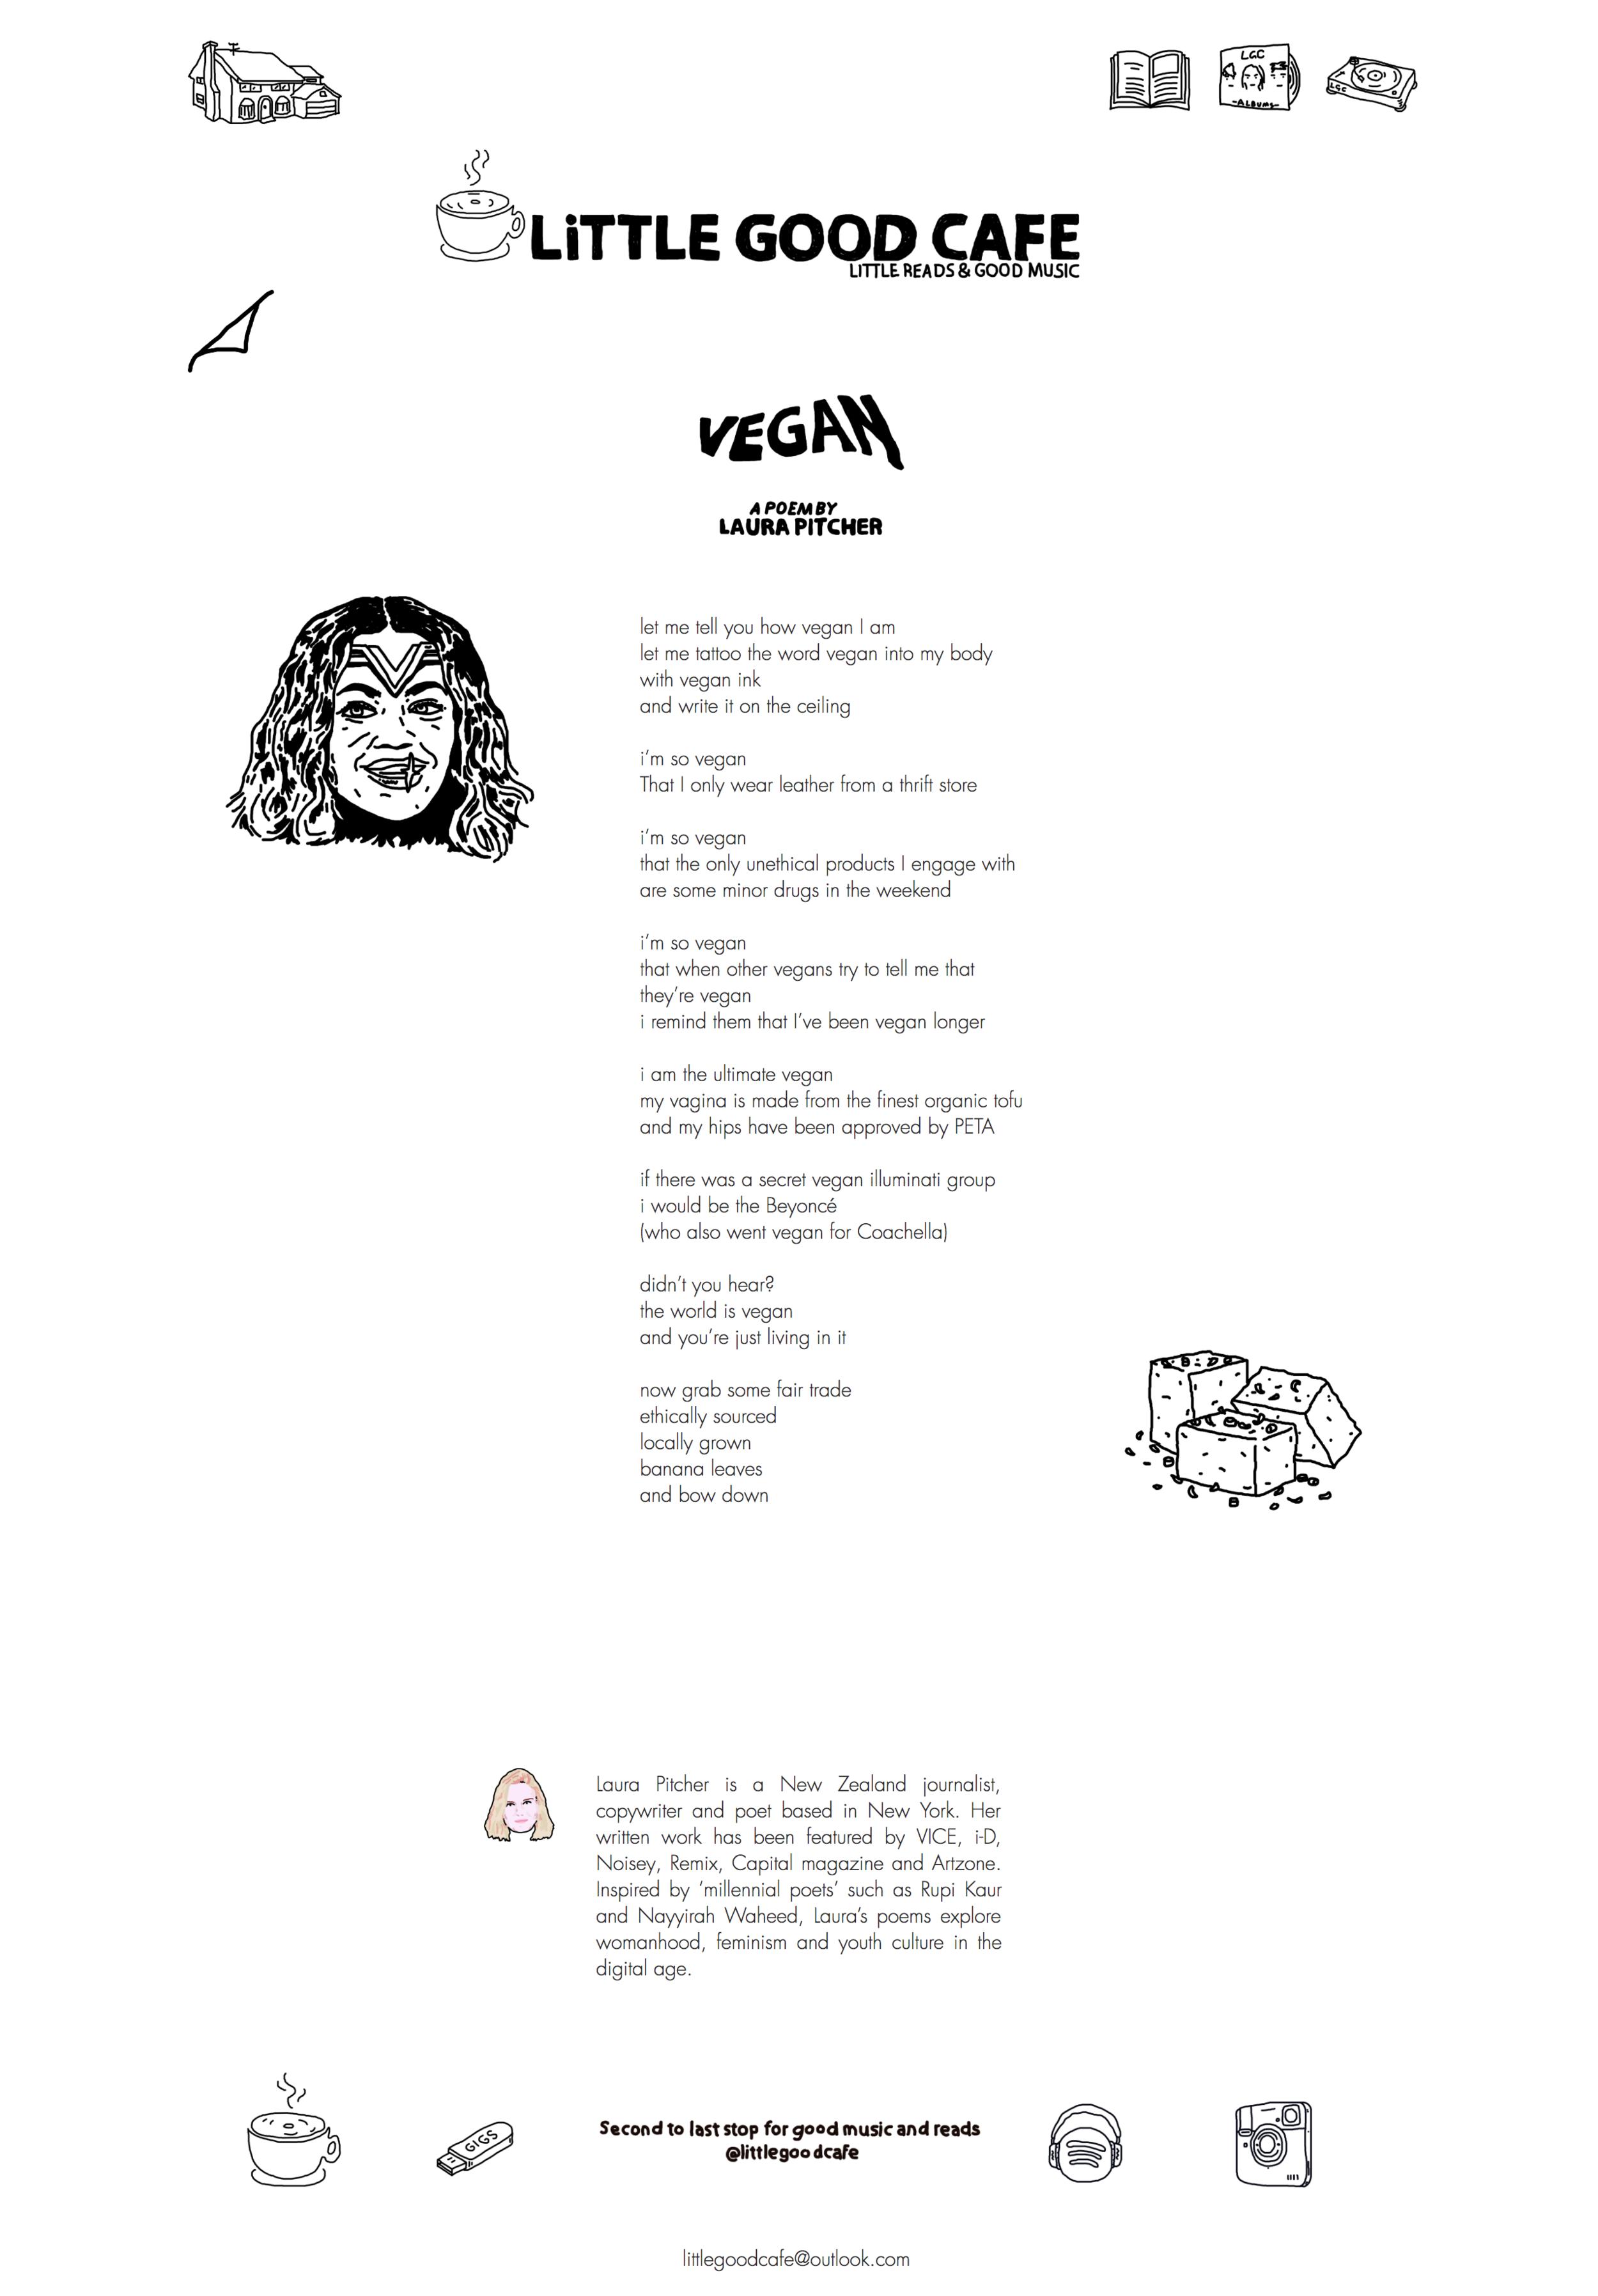 Vegan, Poem By Laura Pitcher   Little Good Cafe.png